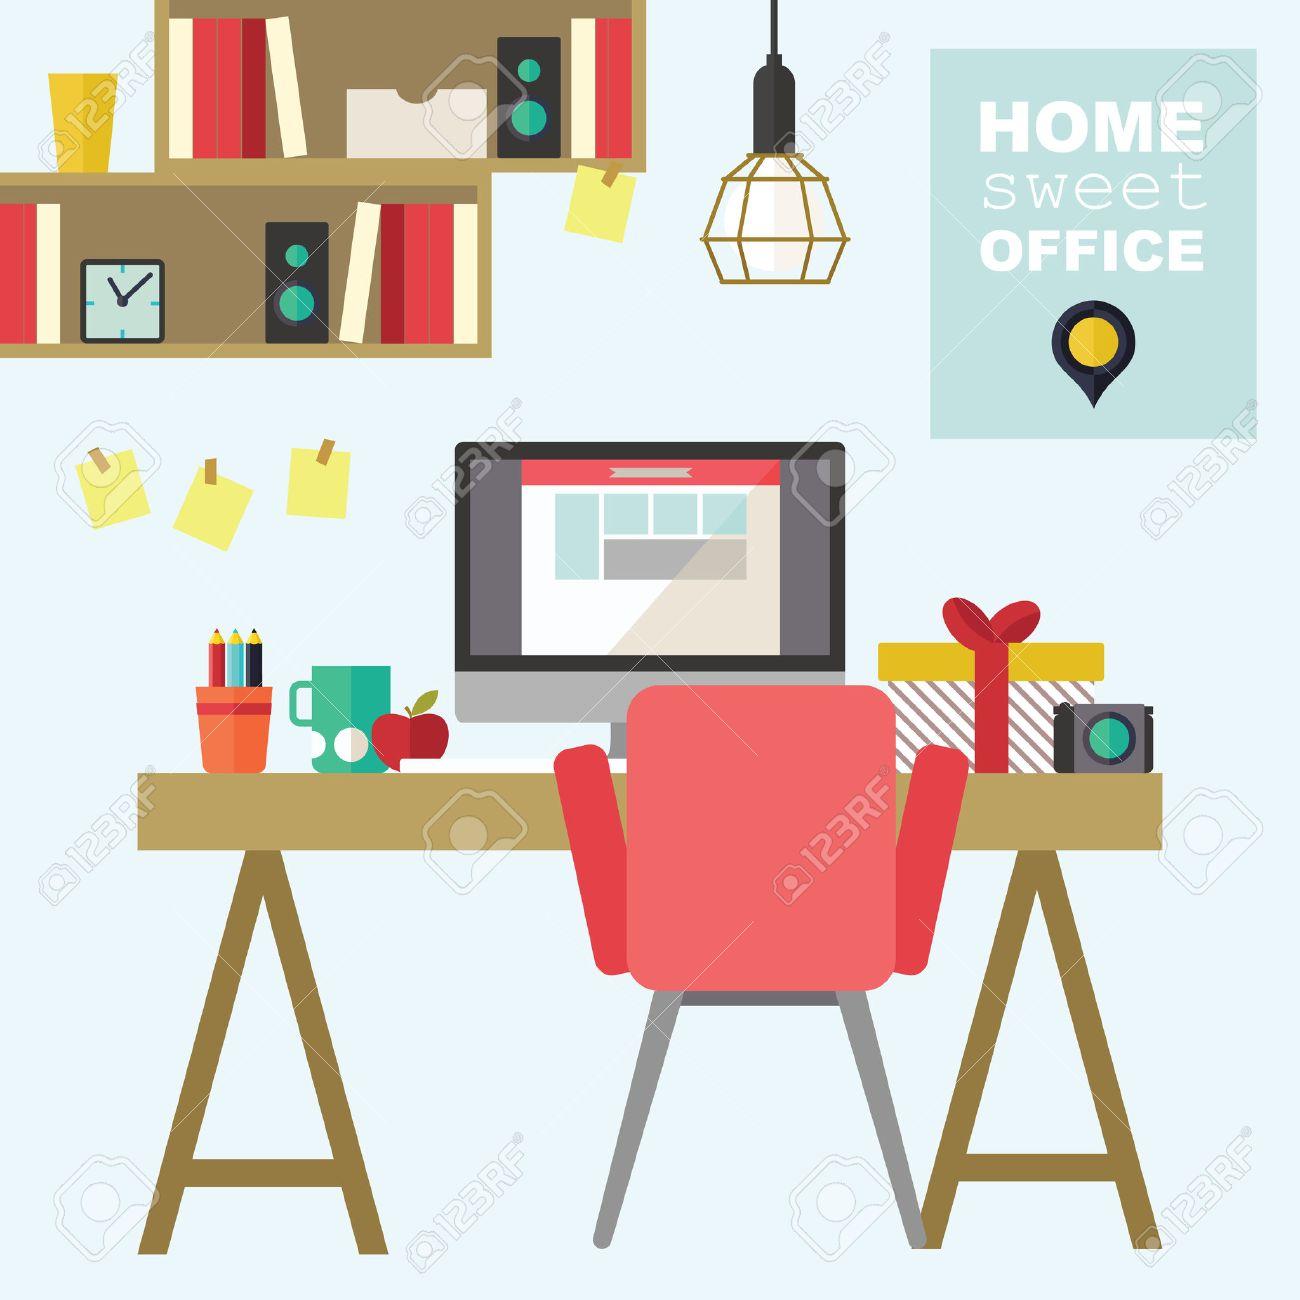 home office flat interior design illustration royalty free cliparts rh 123rf com House Clip Art house interior design clipart